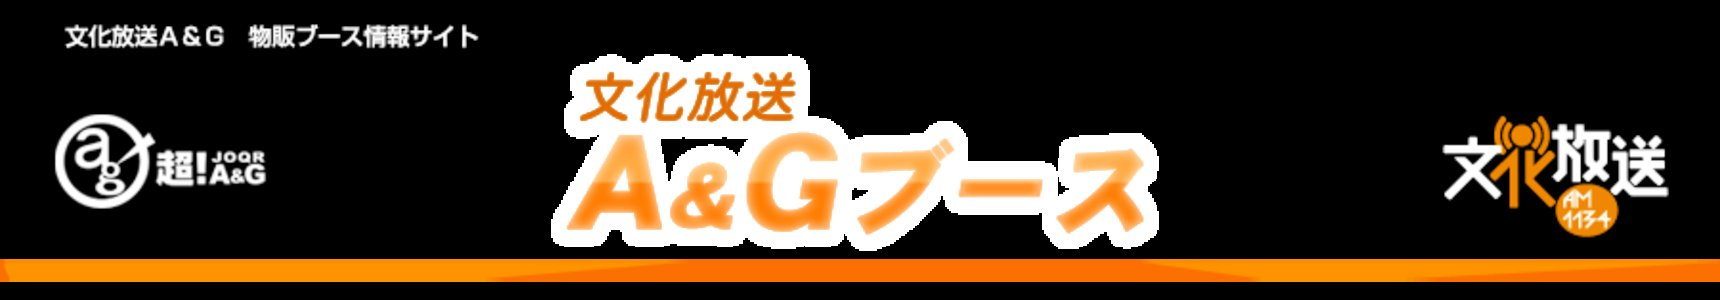 AnimeJapan 2015 2日目 文化放送A&Gブース 『A&G NEXT GENERATION LadyGo!!』お渡し会(小松回)